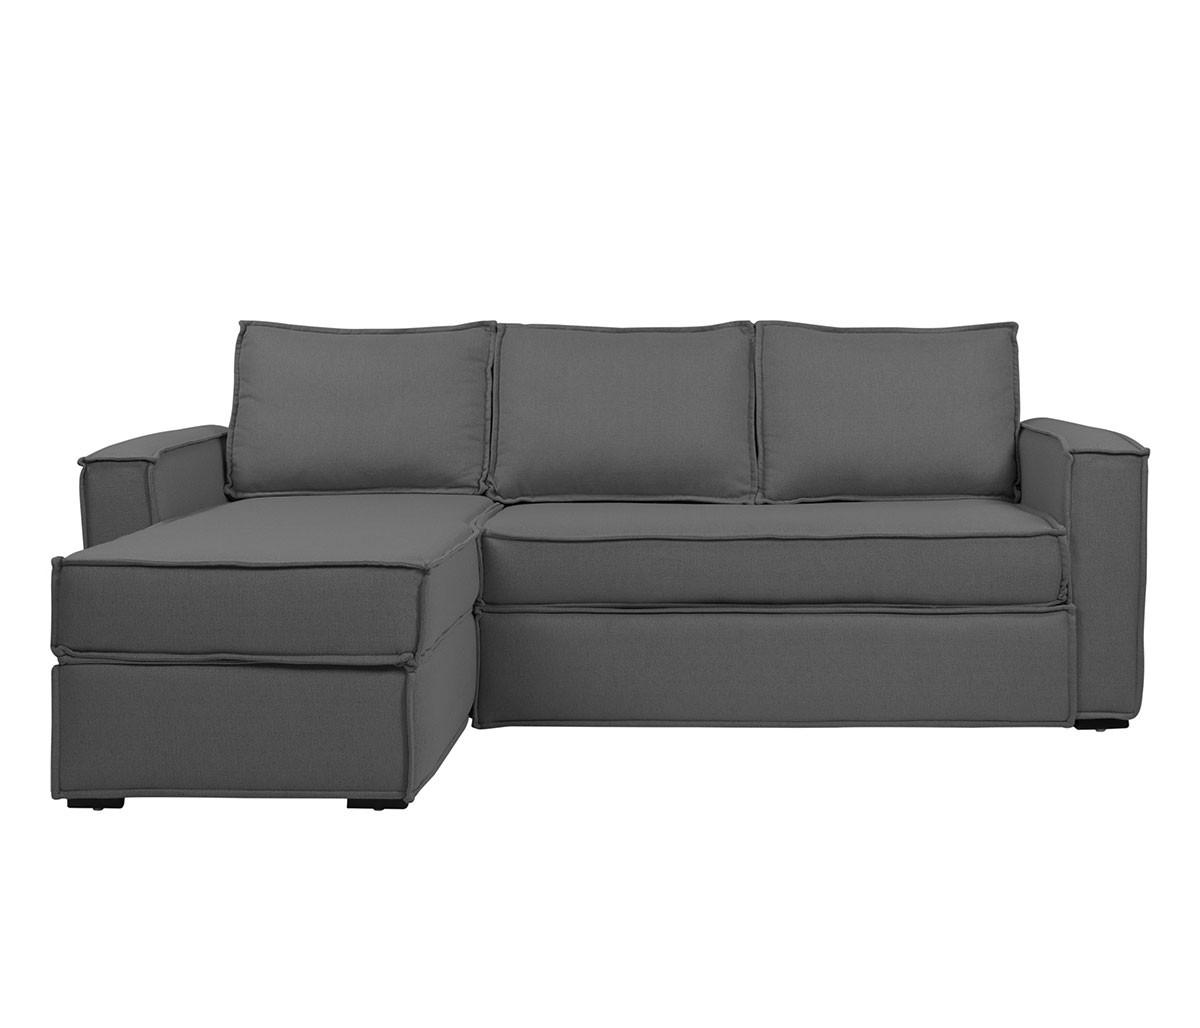 Sofa Cama Con Almacenaje Mndw sofà Cama Con Almacenaje Yamanik